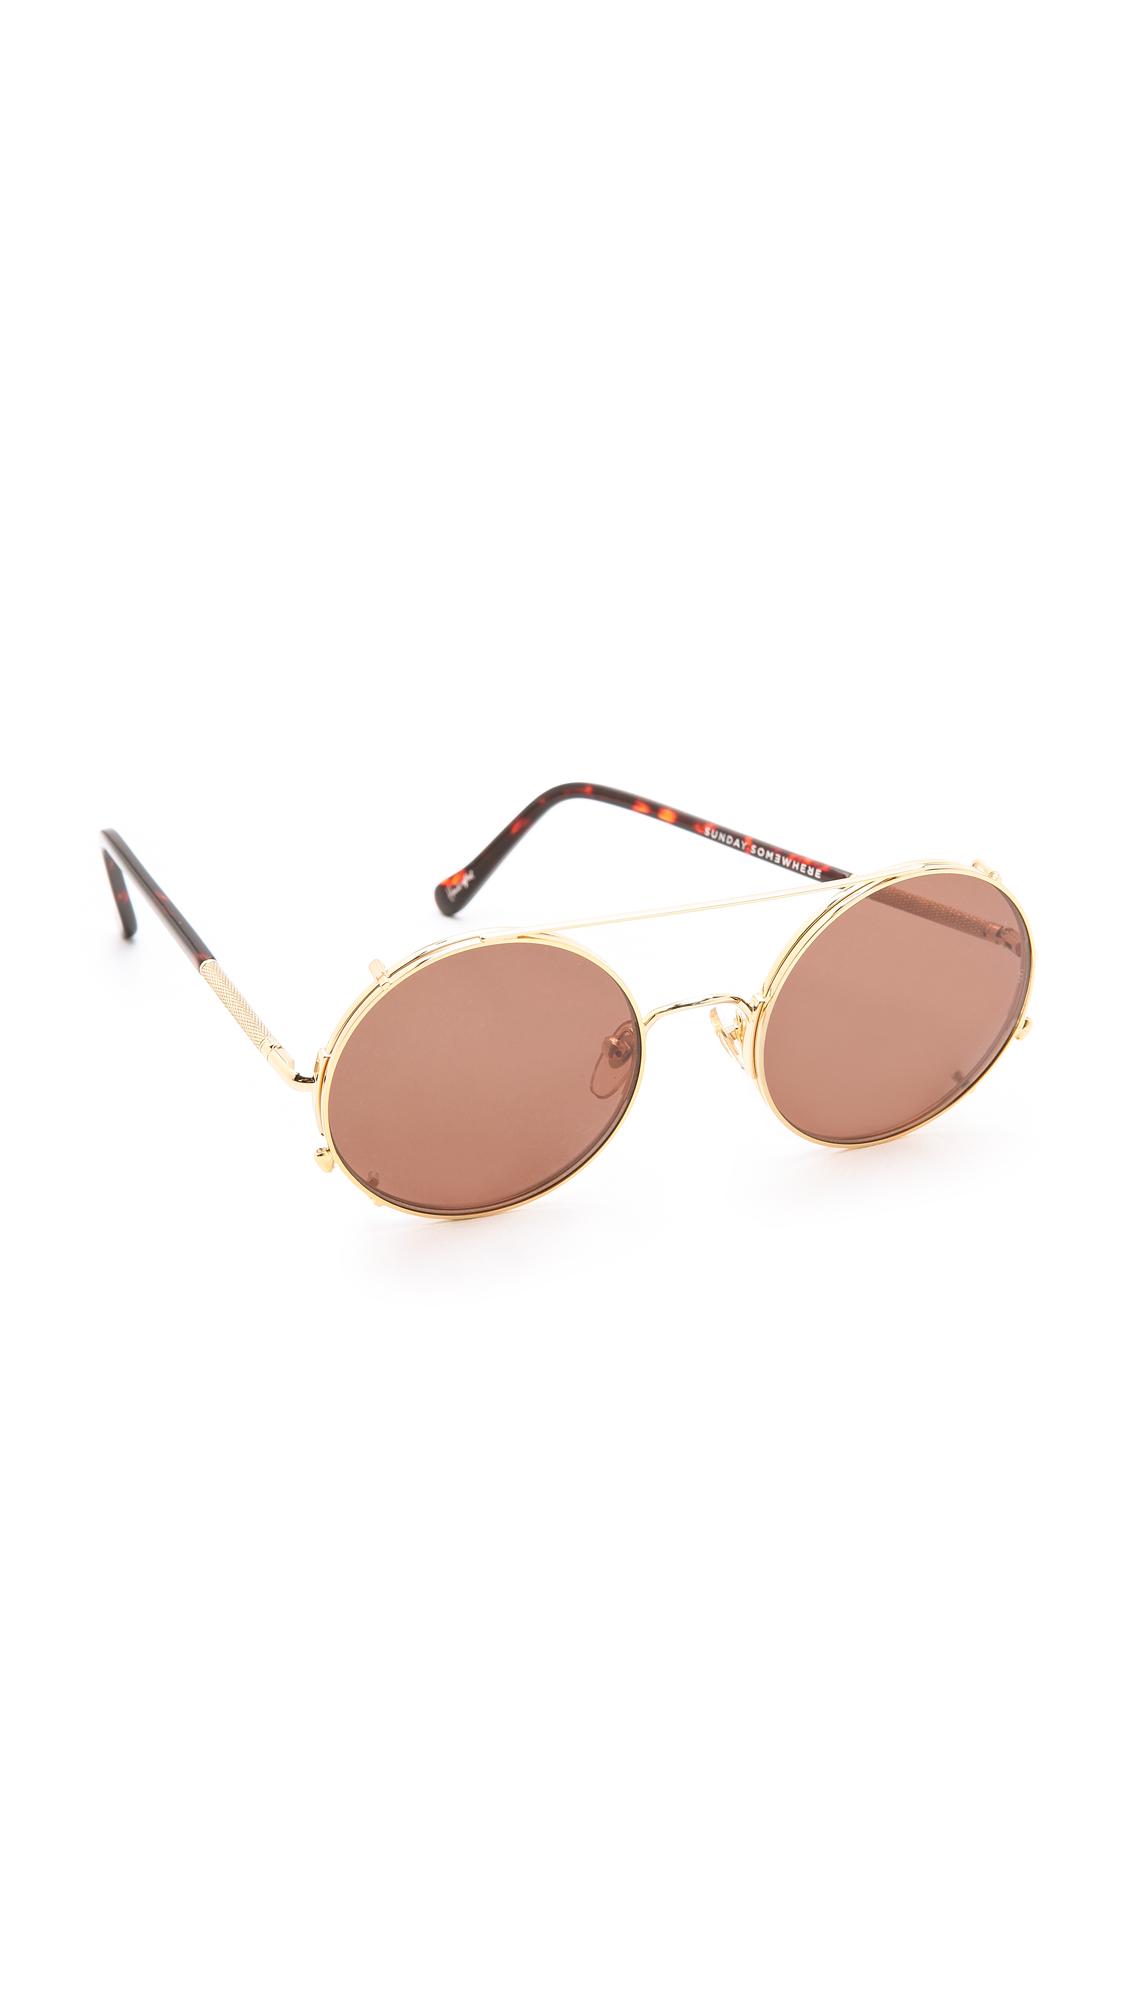 9bdc04e5c78f Sunday Somewhere Valentine Sunglasses in Metallic - Lyst